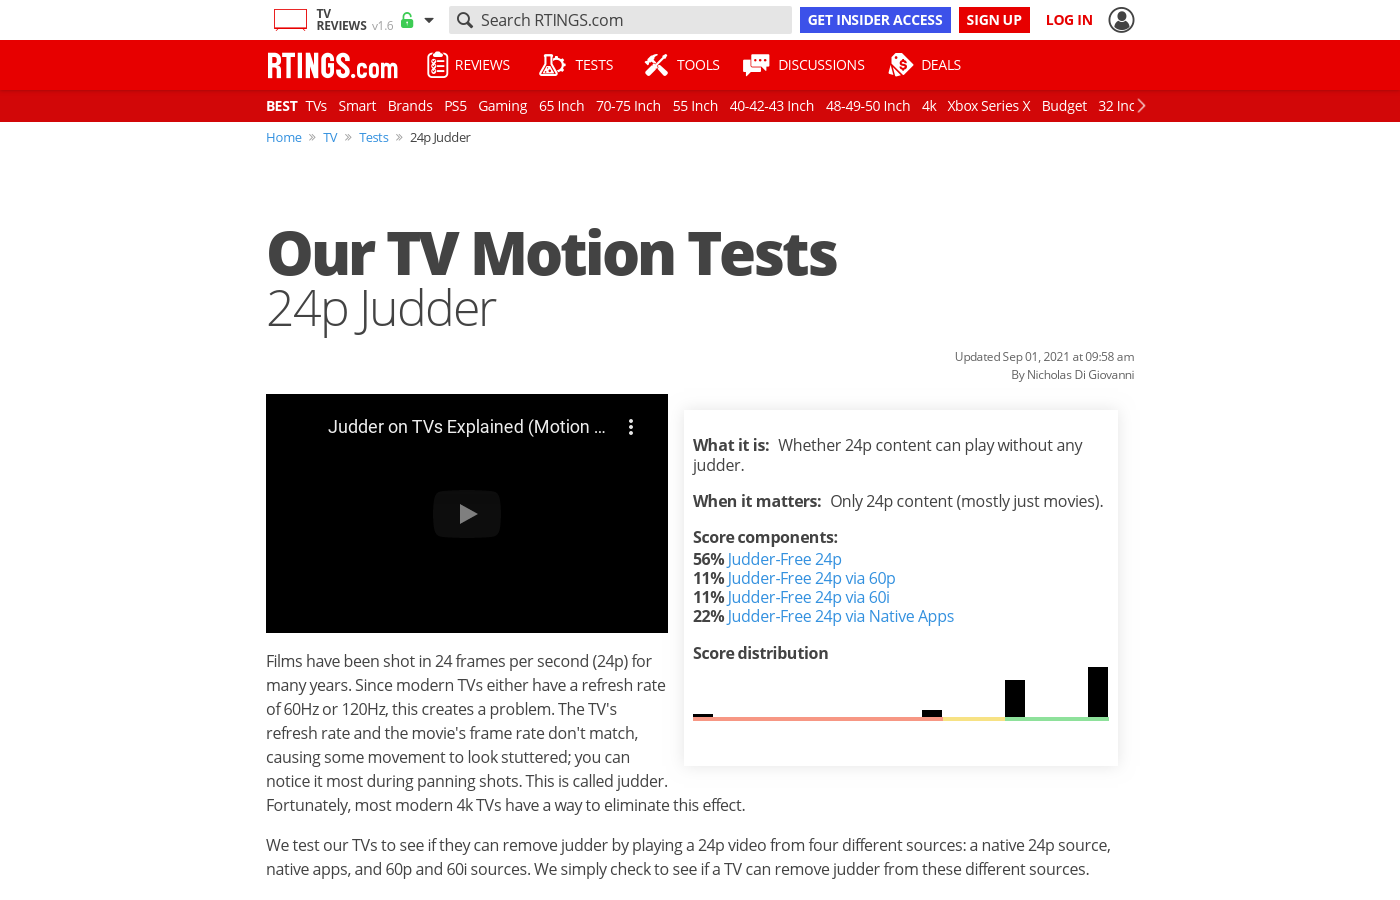 Judder-Free 24p On TVs - RTINGS com